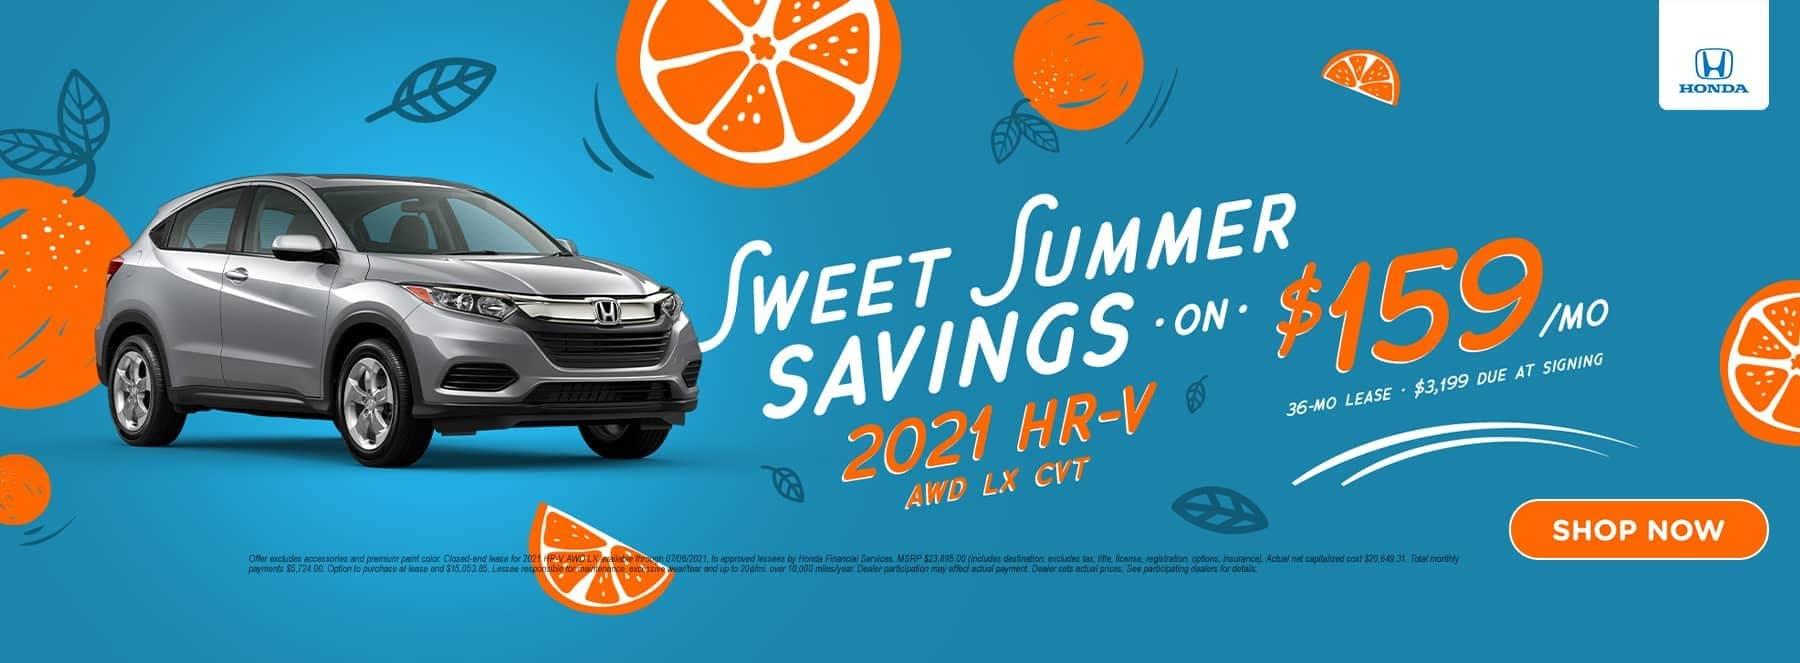 Sweet Summer Savings 2021 HR-V AWD LX CTV